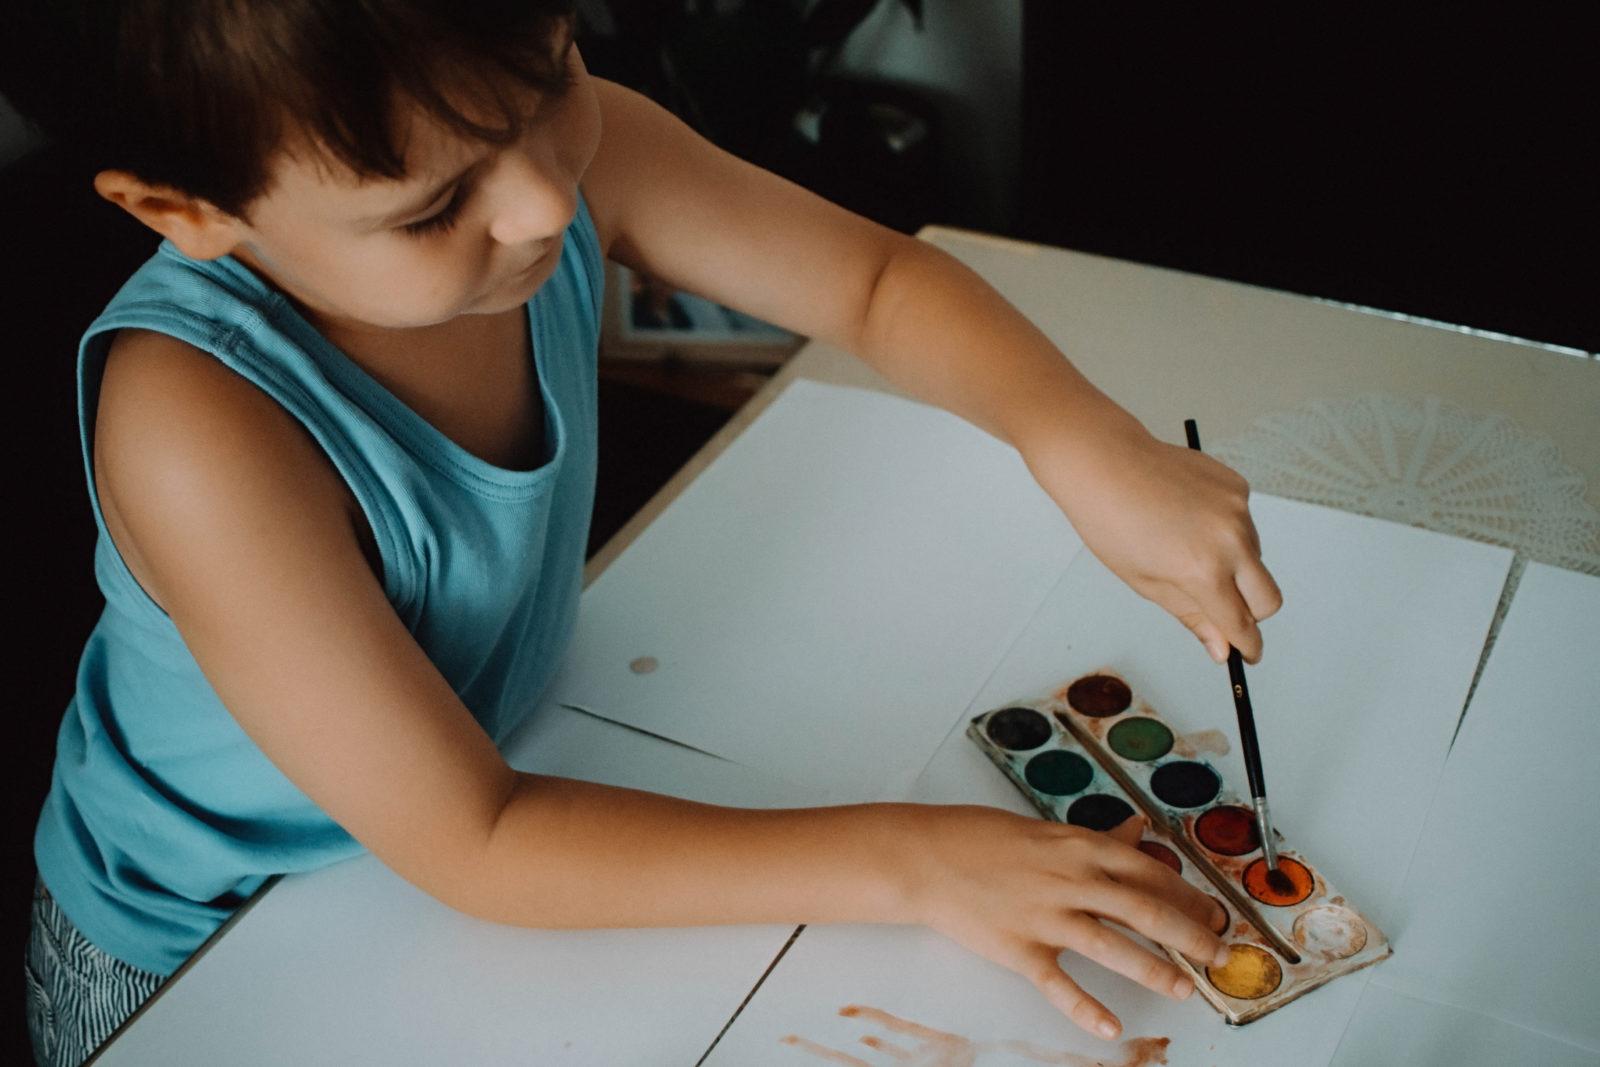 Escuela para Padres: 4 Ejemplos prácticos para reforzar destrezas en matemáticas en casa para nivel elemental e intermedio.